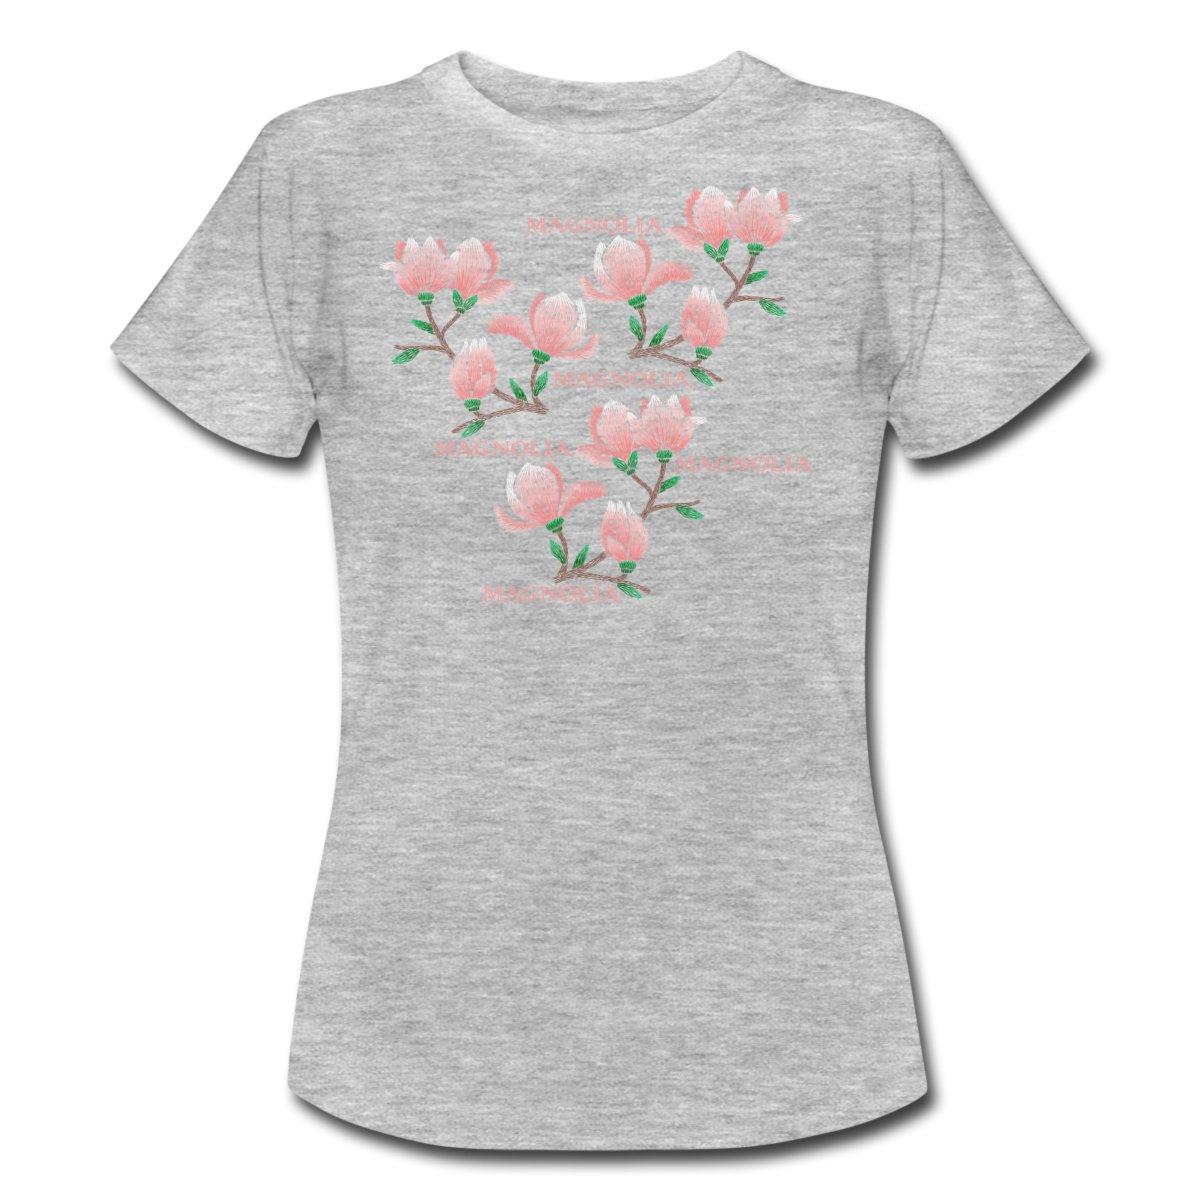 magnolia-t-shirt-dam-grå.jpg